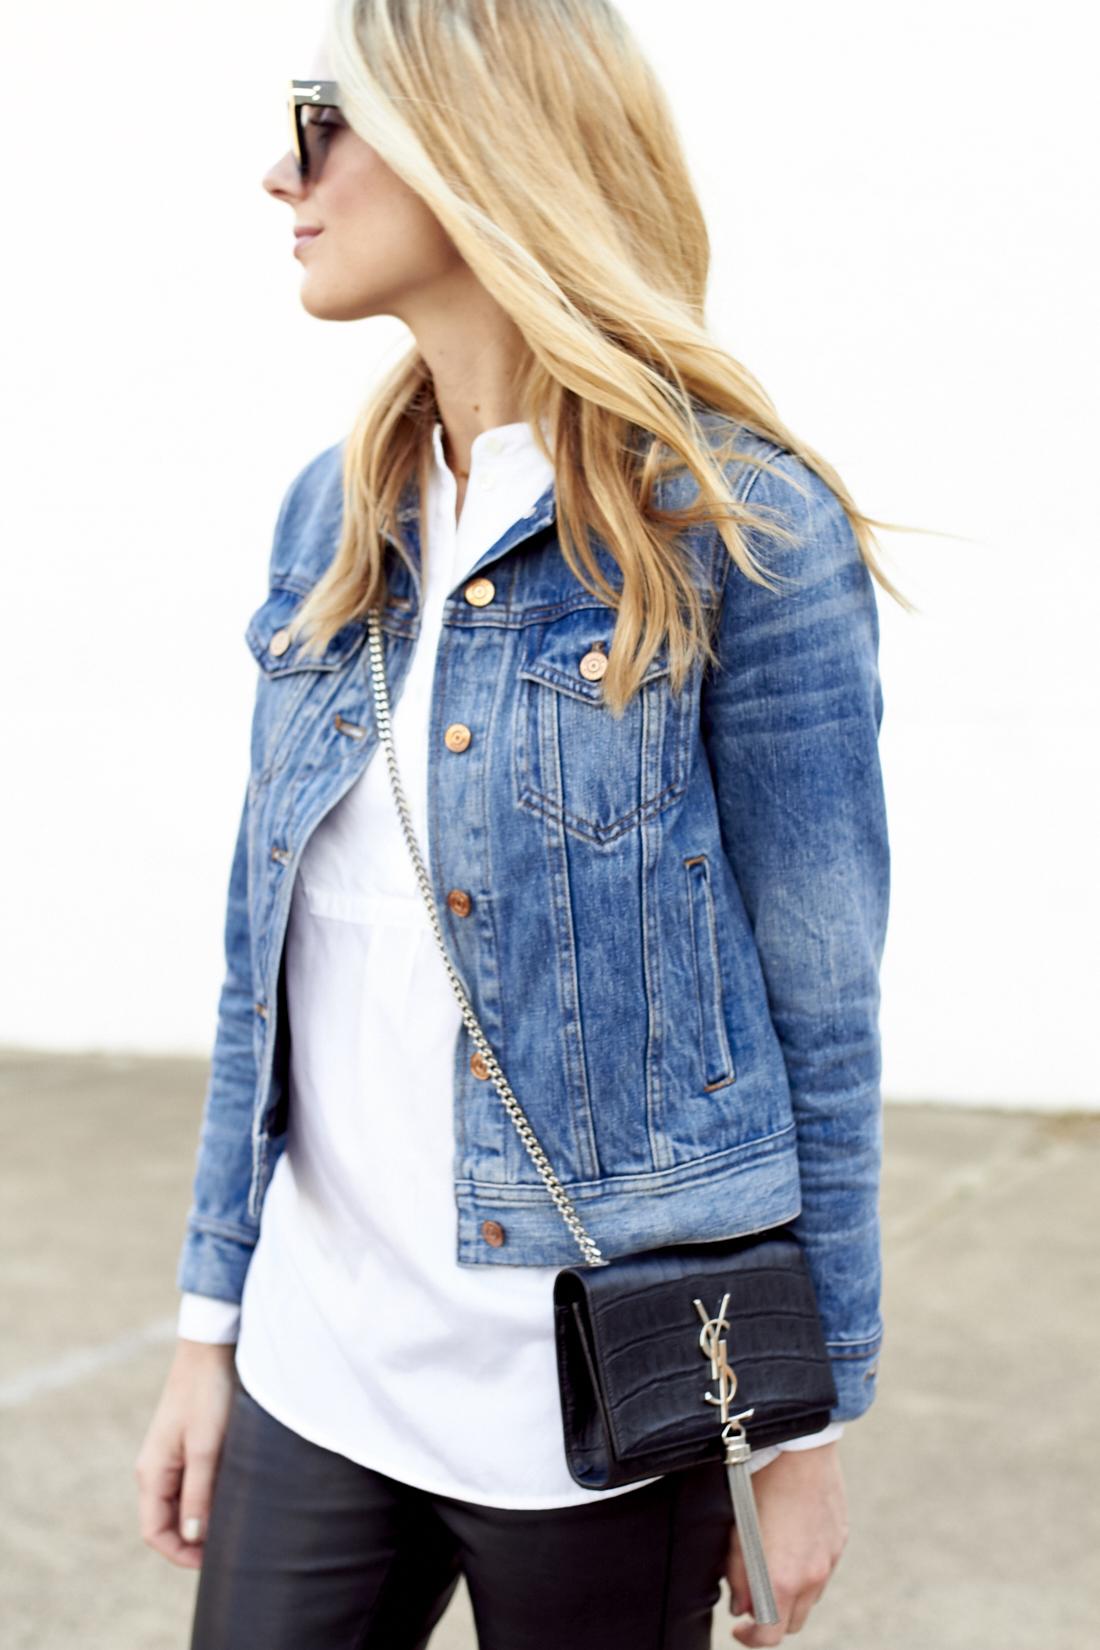 fashion-jackson-jcrew-denim-jacket-saint-laurent-monogram-handbag